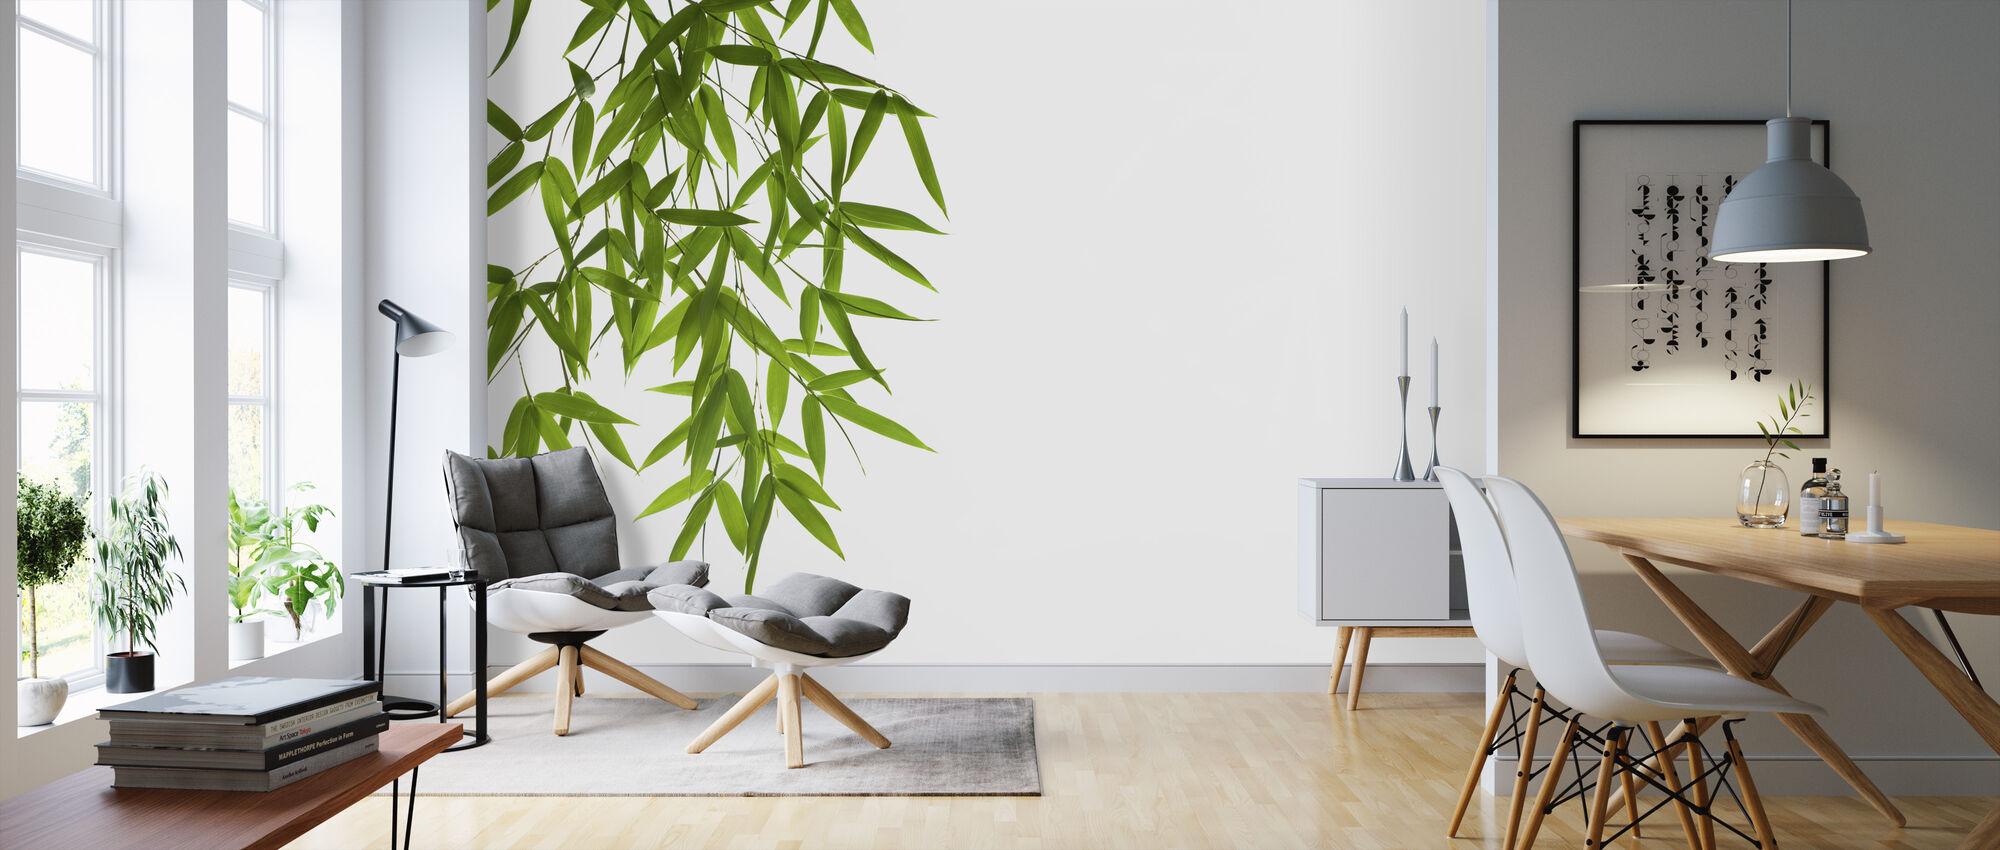 Hangende Bamboe - Behang - Woonkamer